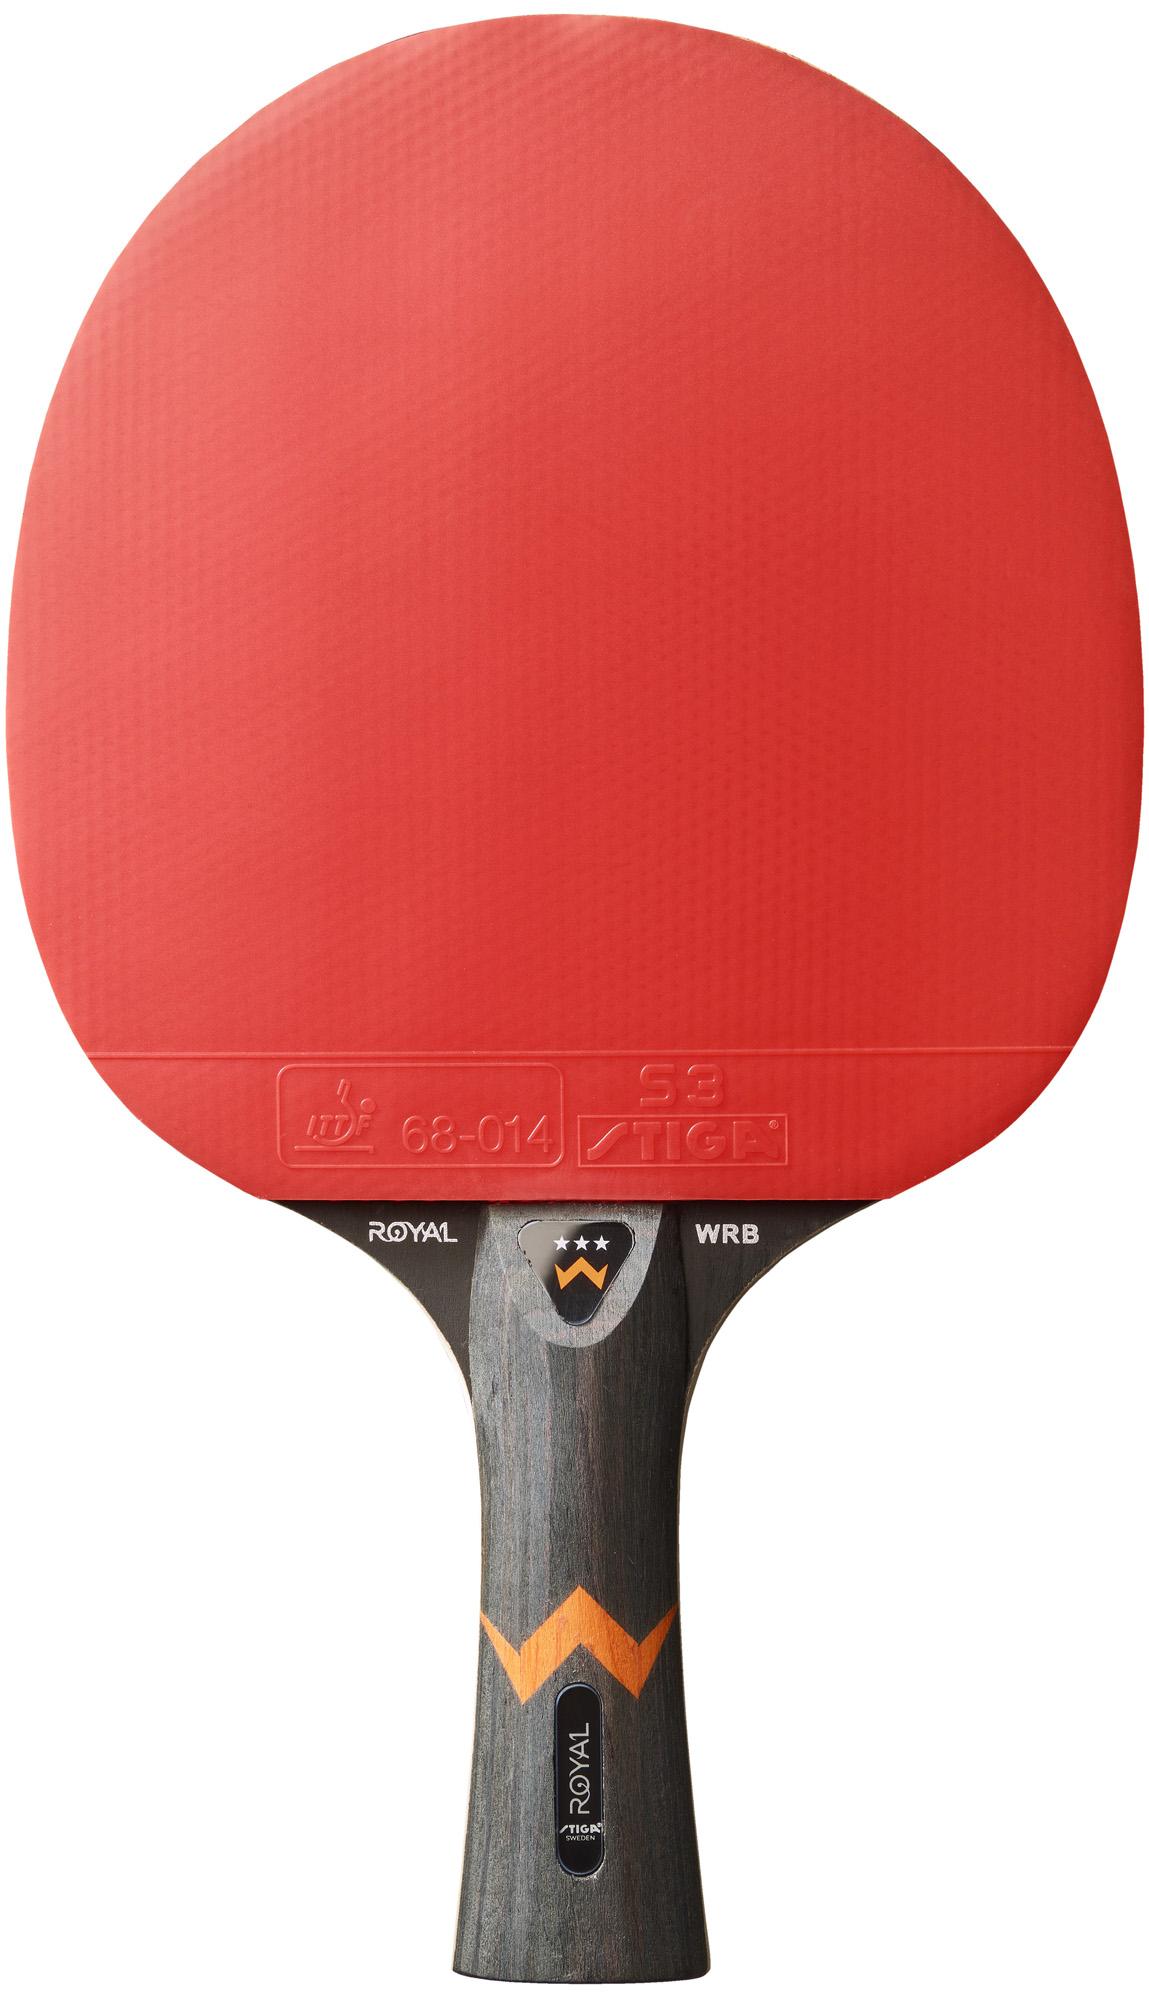 Stiga Ракетка для настольного тенниса Stiga ROYAL 3-star WRB все цены